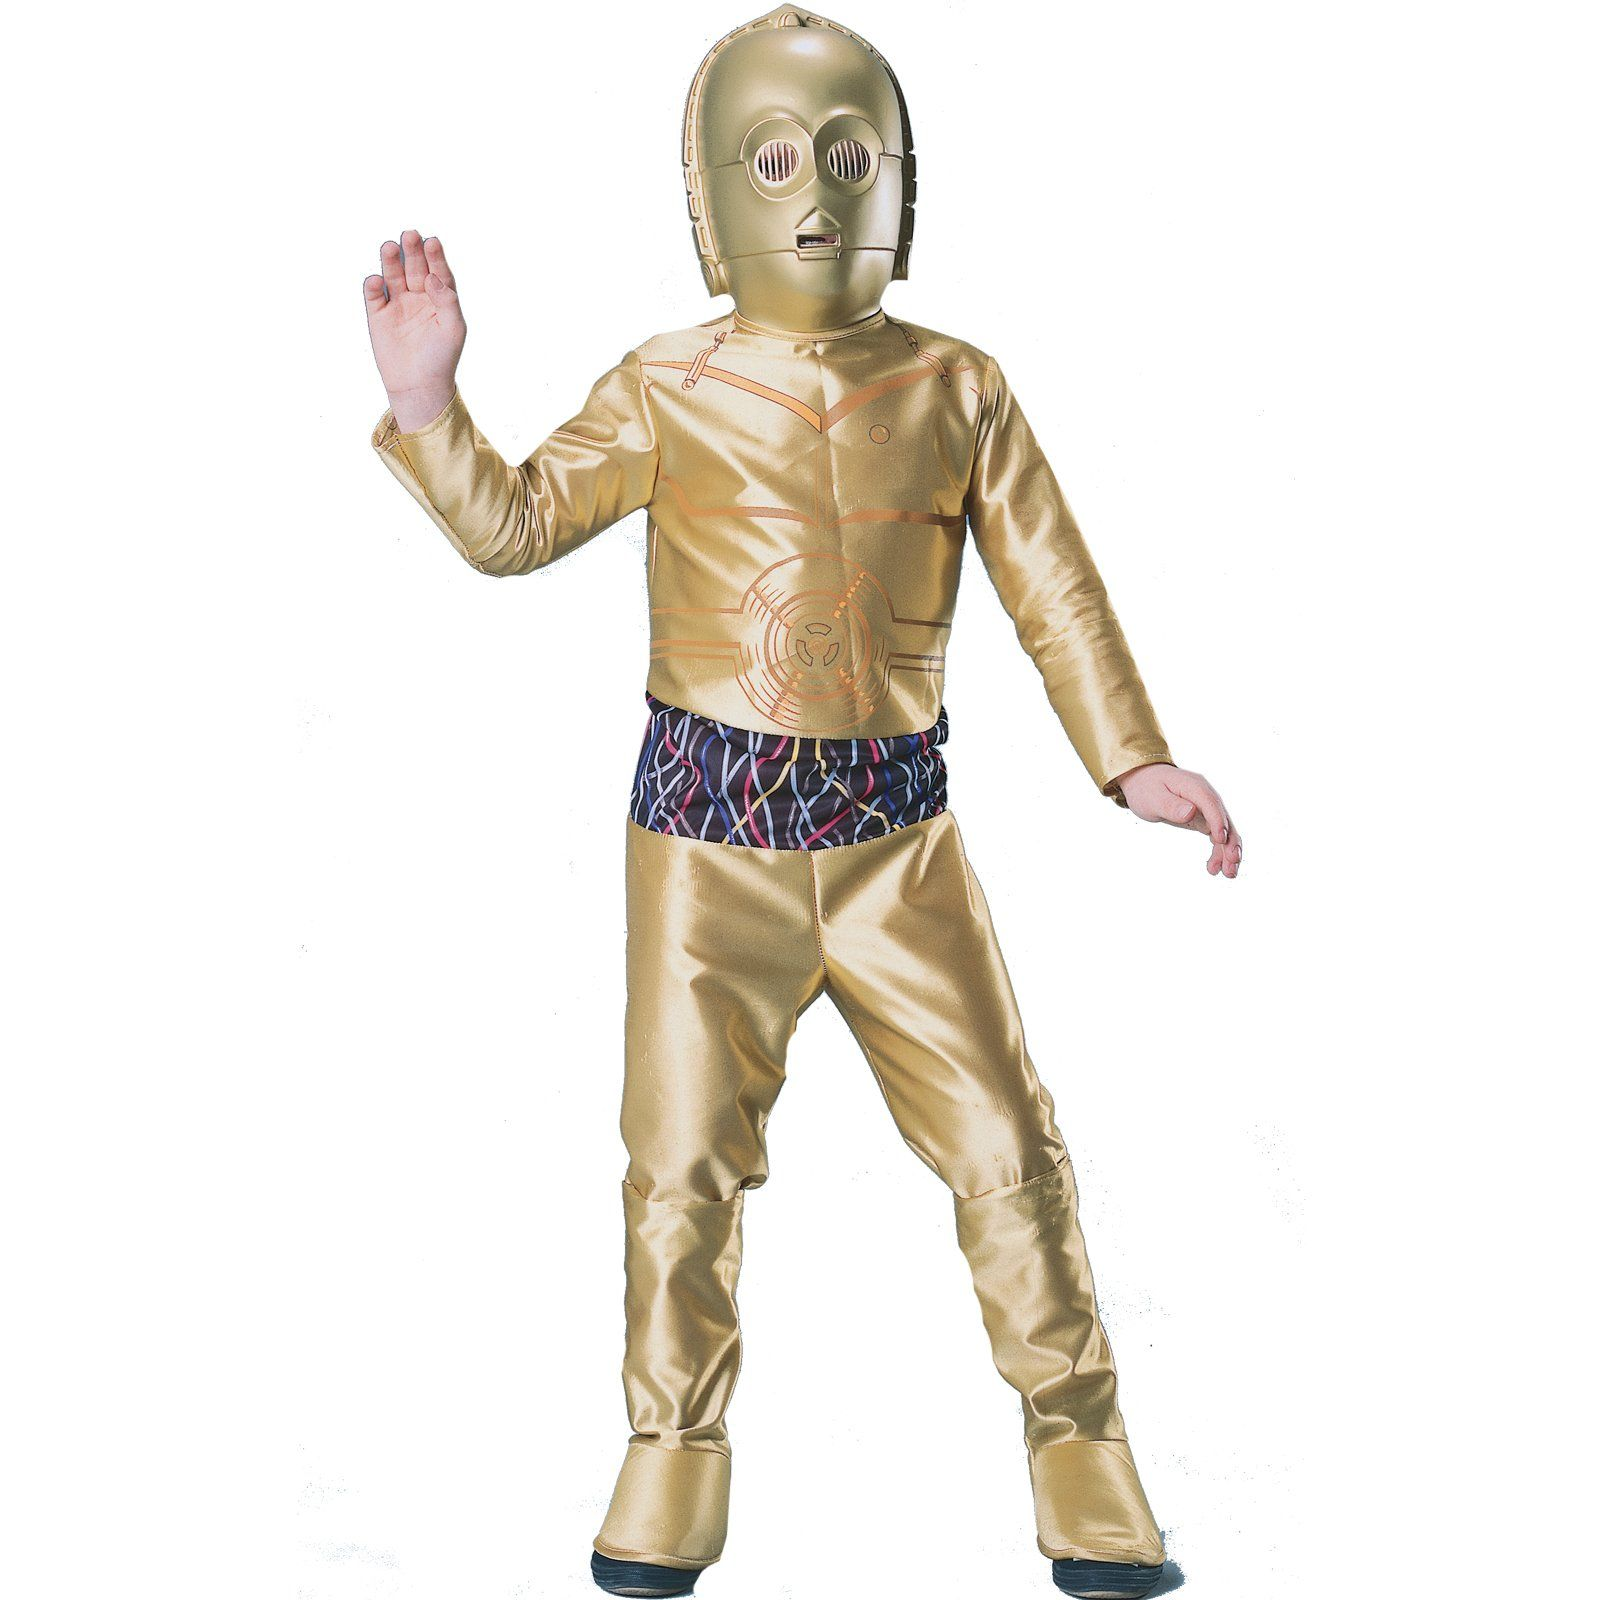 Ben thinks that this costume looks creepy   Ben's Pins   Pinterest ...